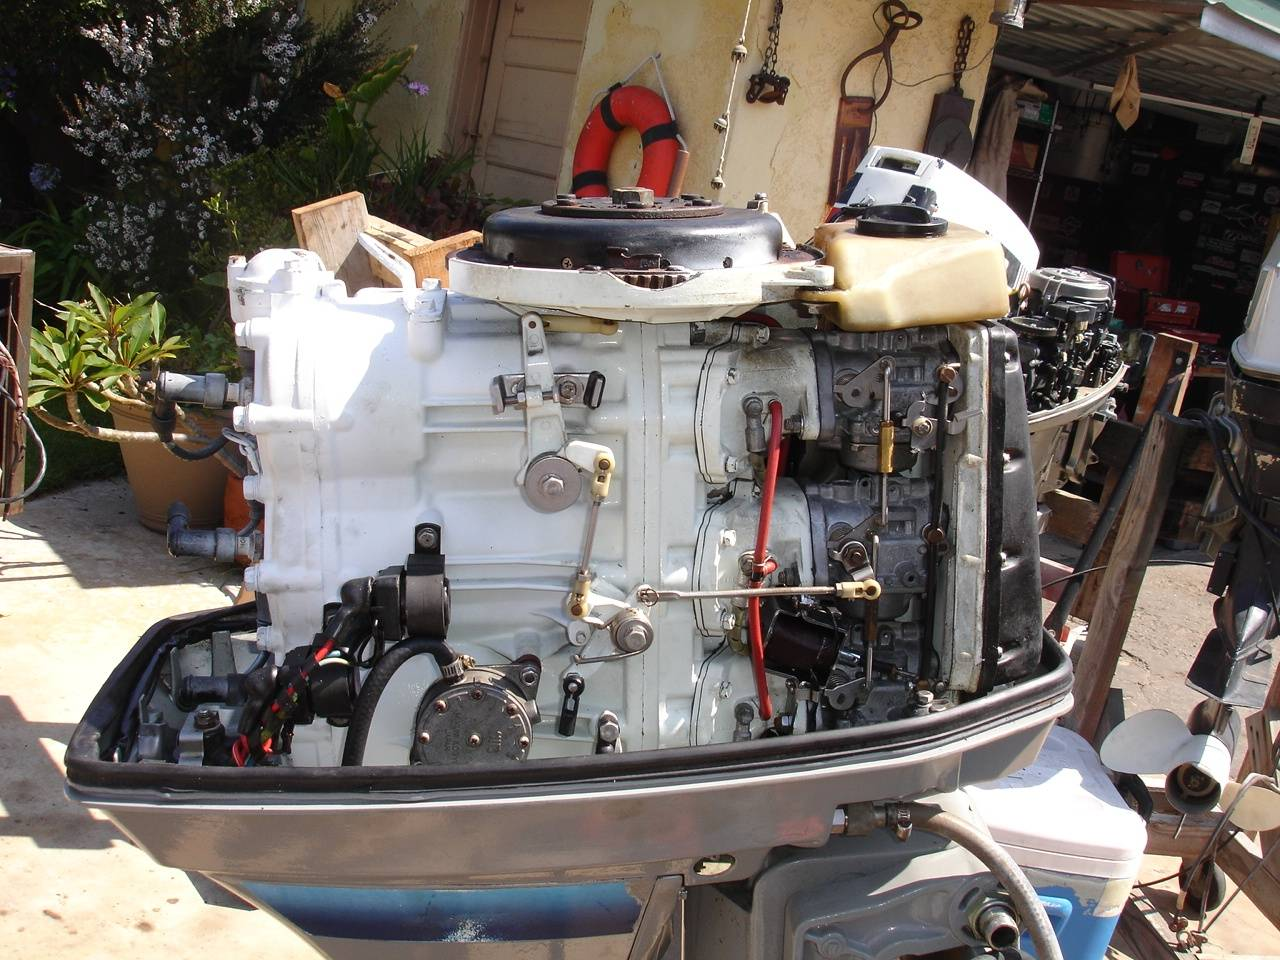 80 s suzuki 85hp outboard bloodydecks rh bdoutdoors com 85 hp suzuki outboard motor for sale suzuki 85 hp outboard motor